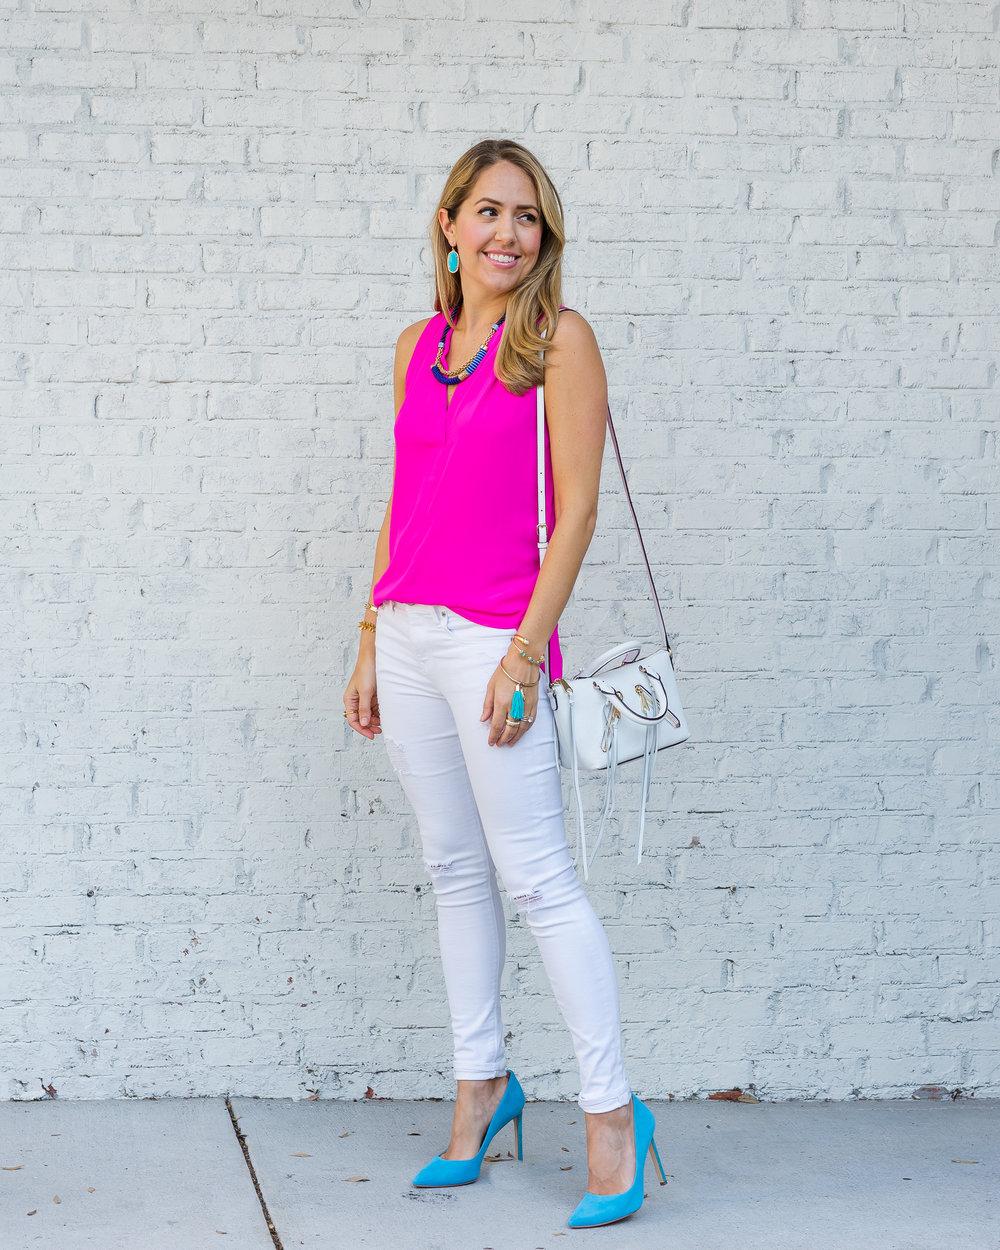 Todayu0026#39;s Everyday Fashion Hot Pink u2014 Ju0026#39;s Everyday Fashion